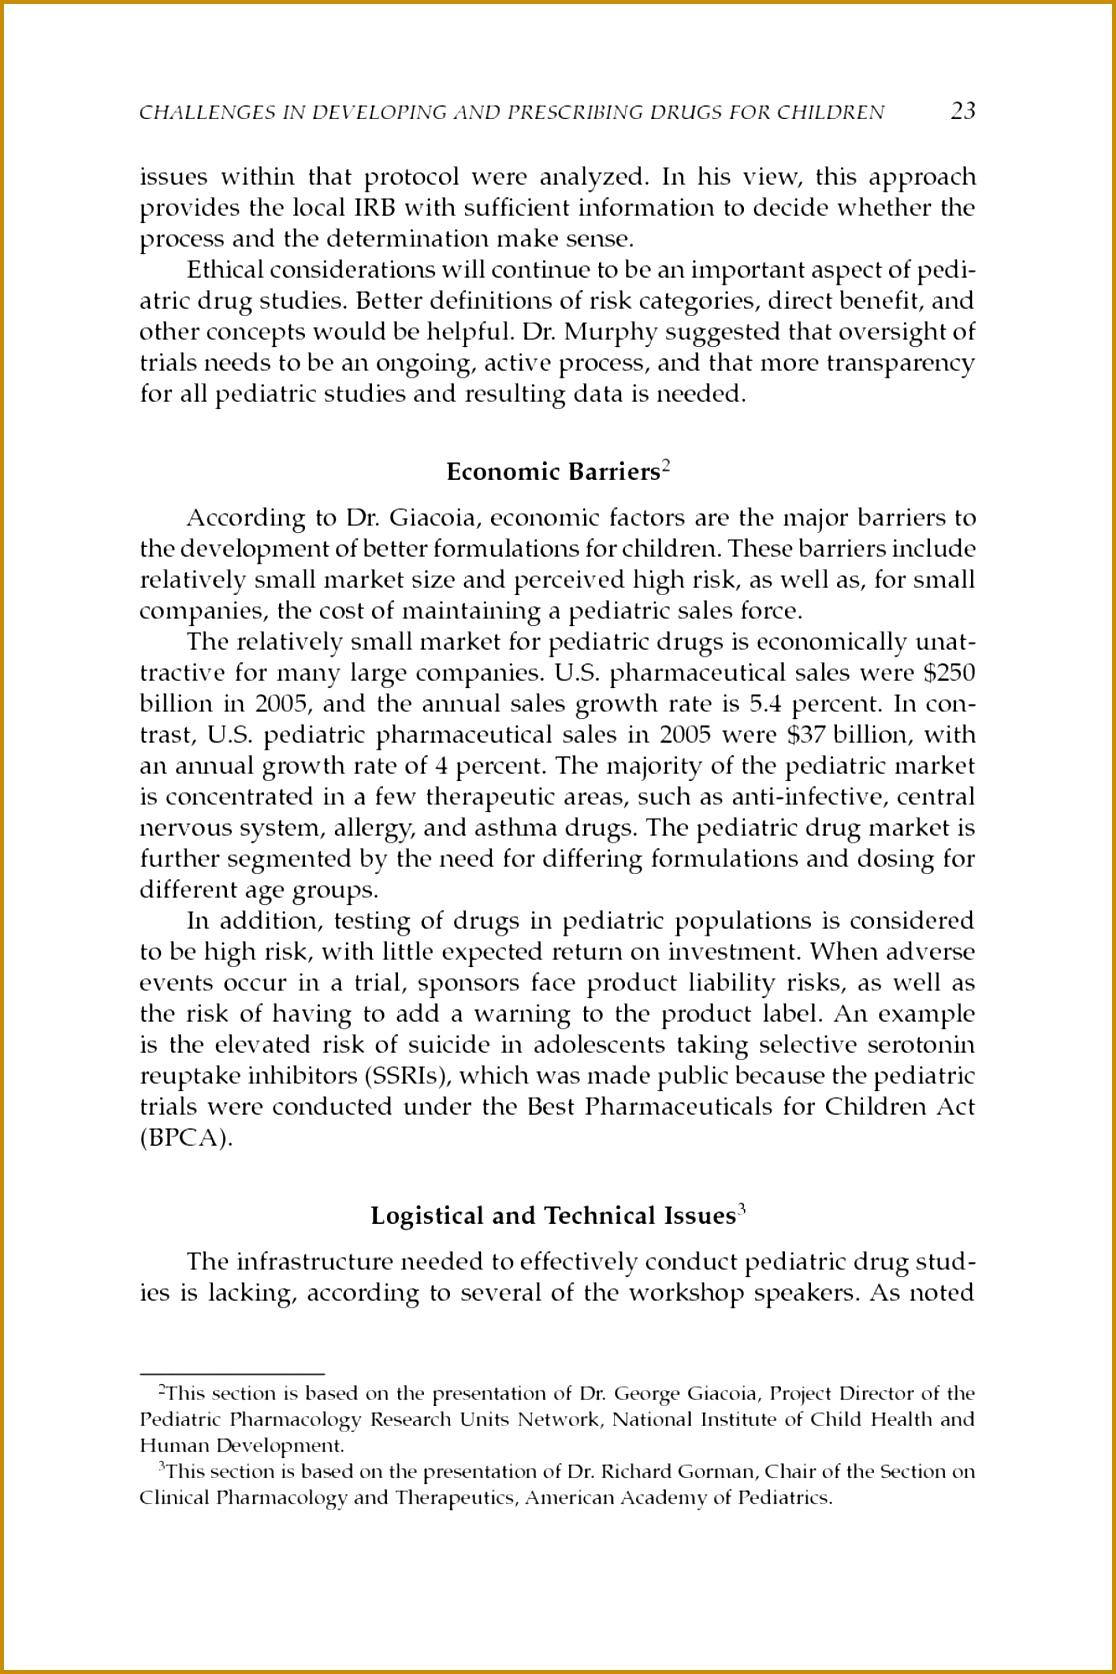 7 Cover Letter For Teaching Position